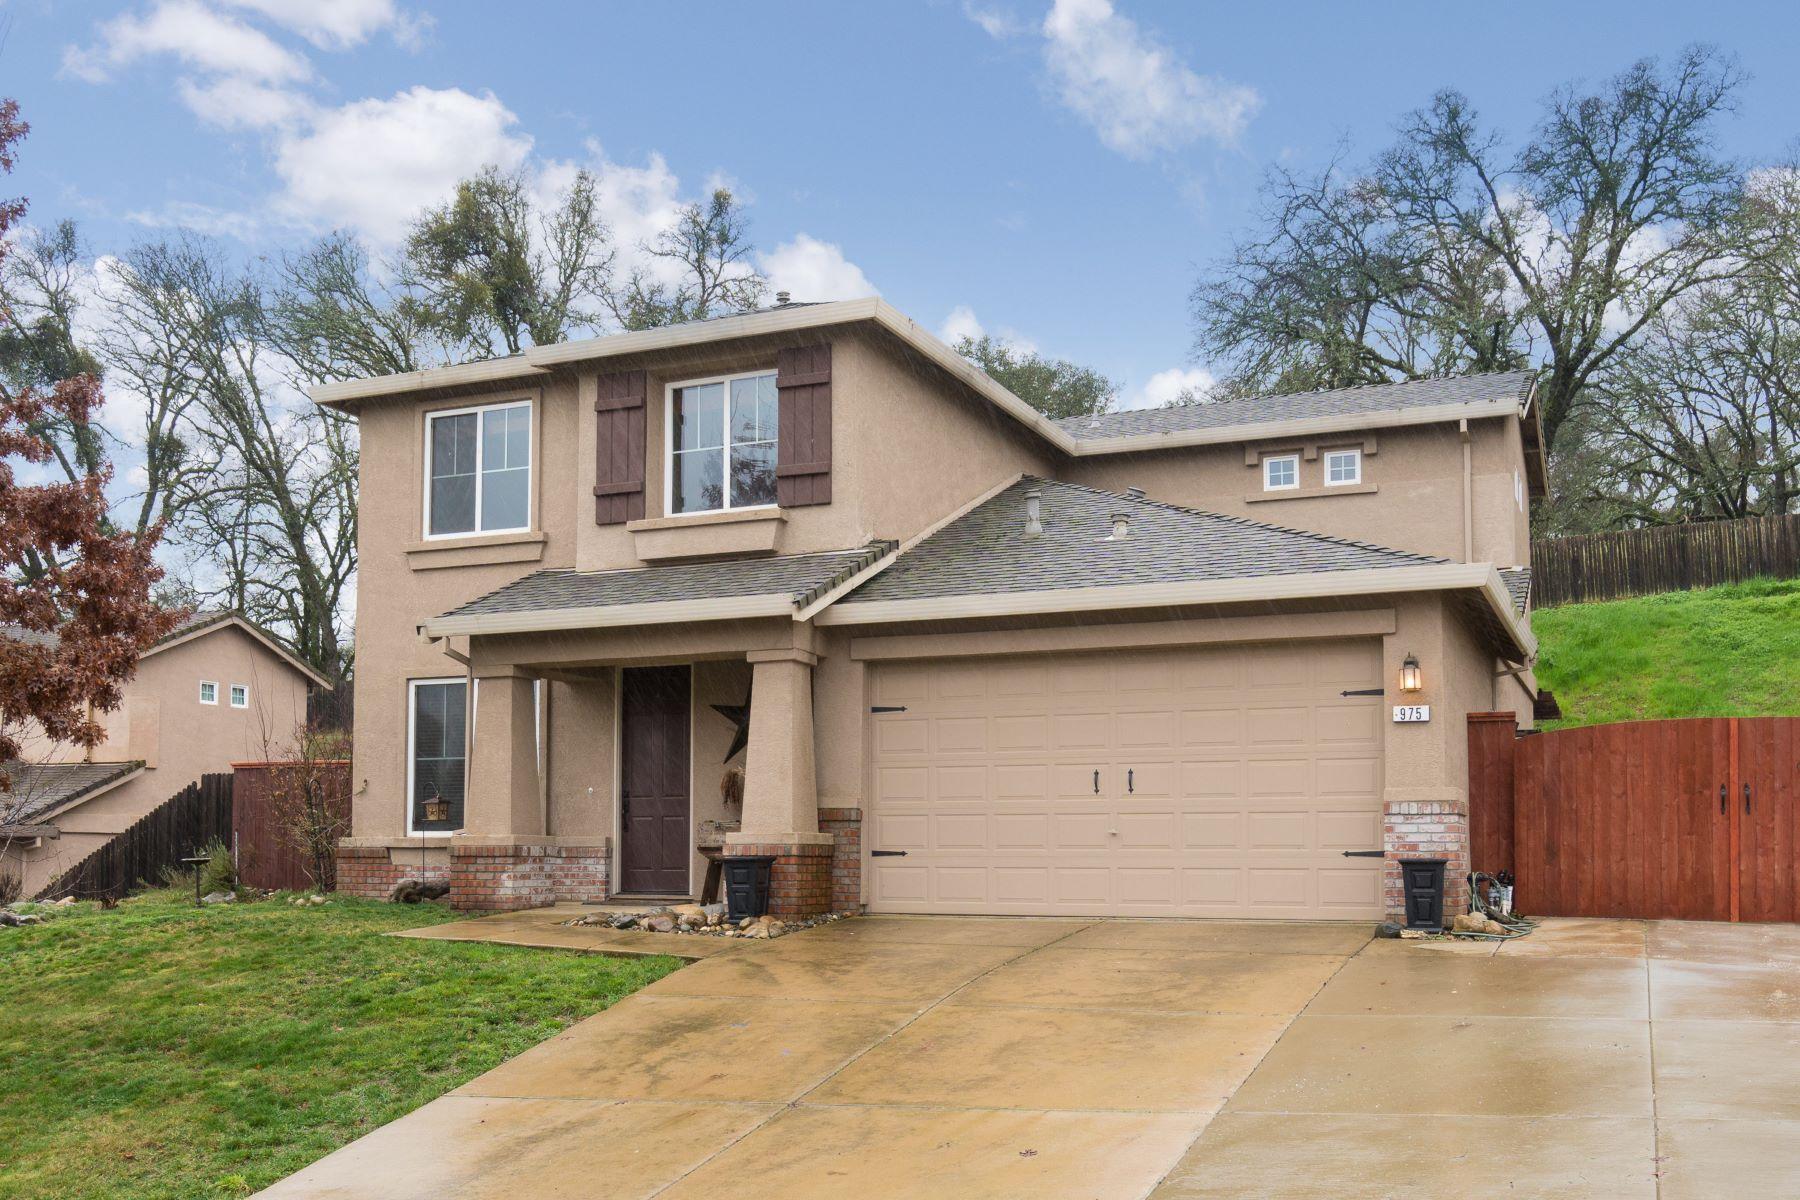 Single Family Home for Sale at 975 Ponderosa Street Jackson, California 95642 United States